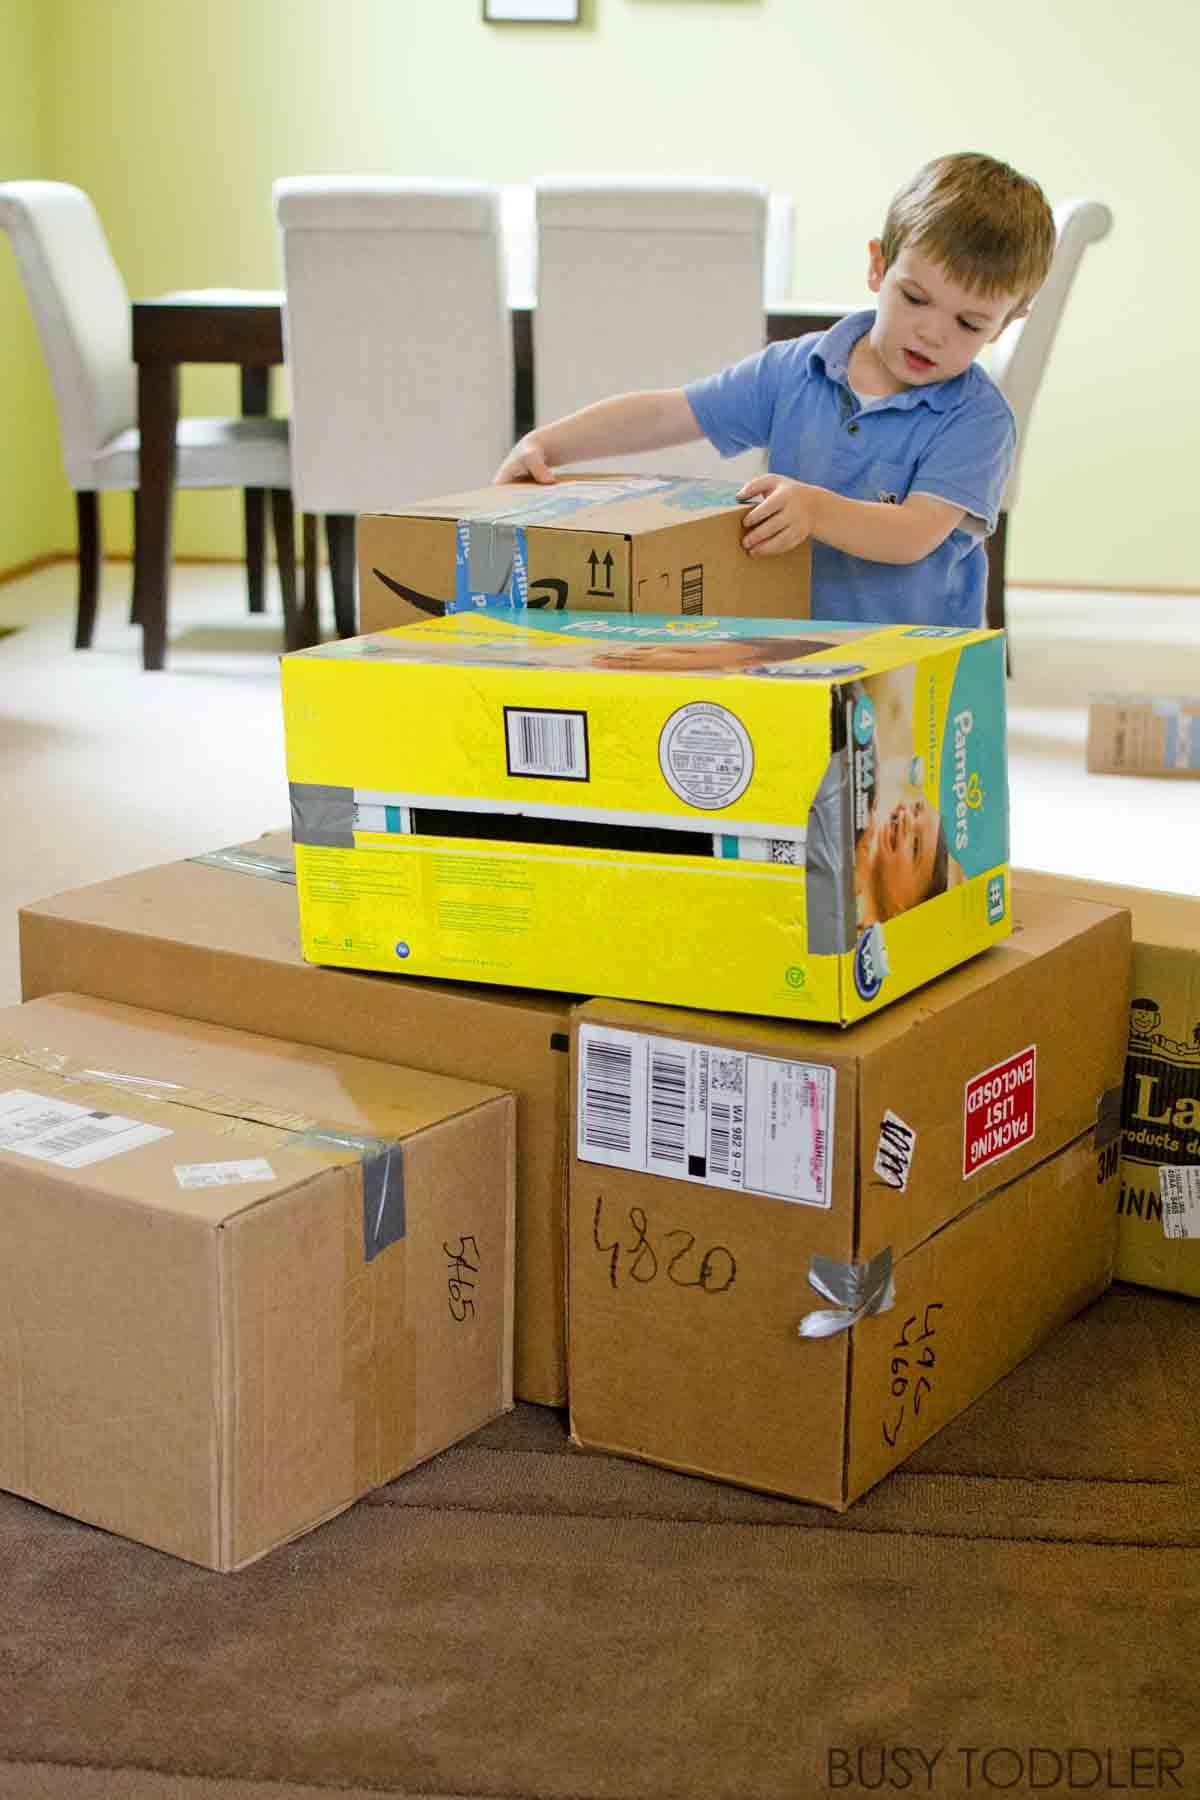 Giant Building Blocks Toddler STEM Activity Busy Toddler